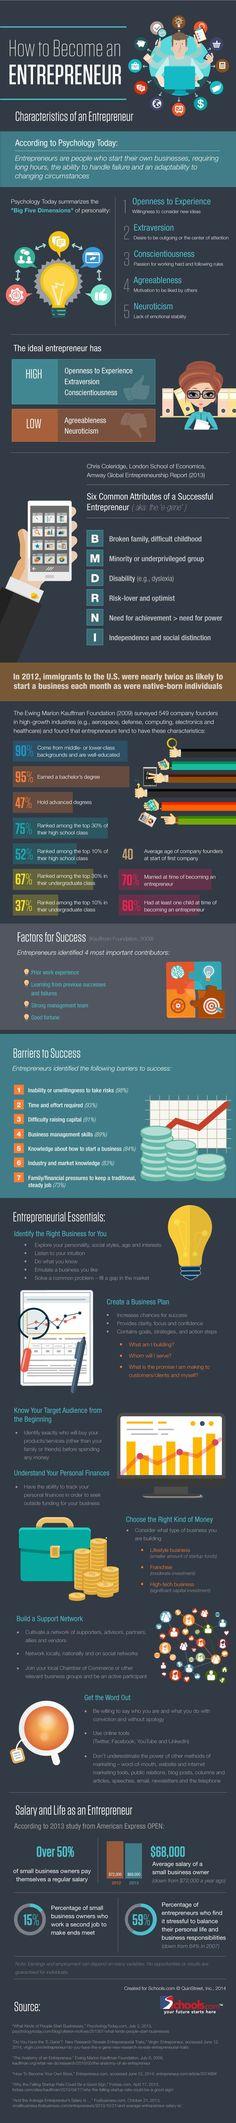 17 Characteristics of Successful Entrepreneurs